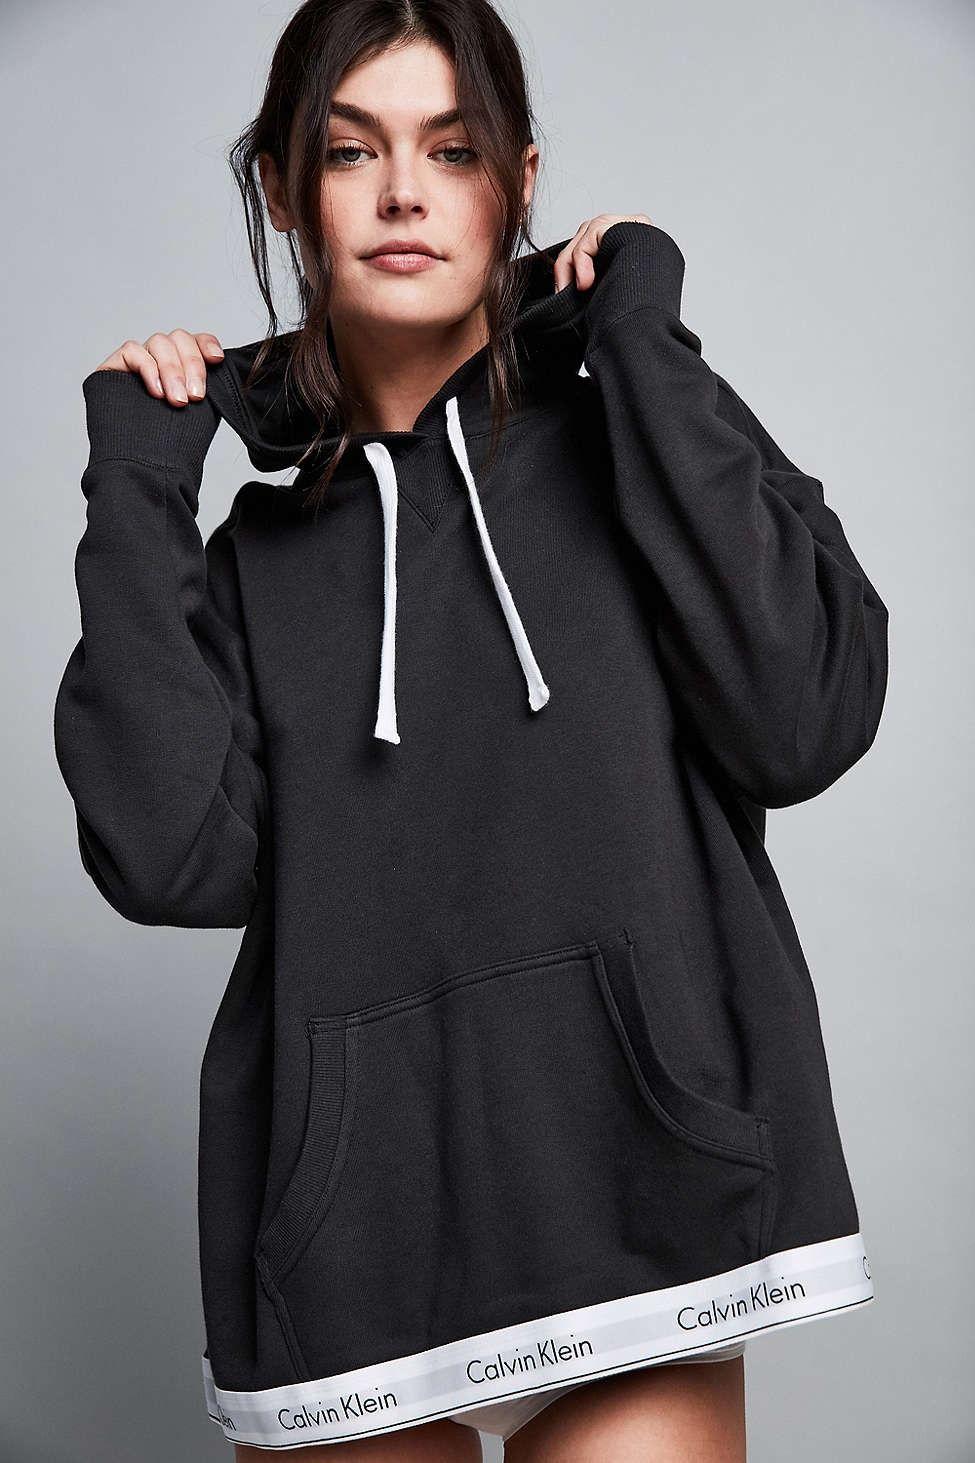 calvin klein modern cotton hoodie sweatshirt urban outfitters urban and sweatshirt. Black Bedroom Furniture Sets. Home Design Ideas